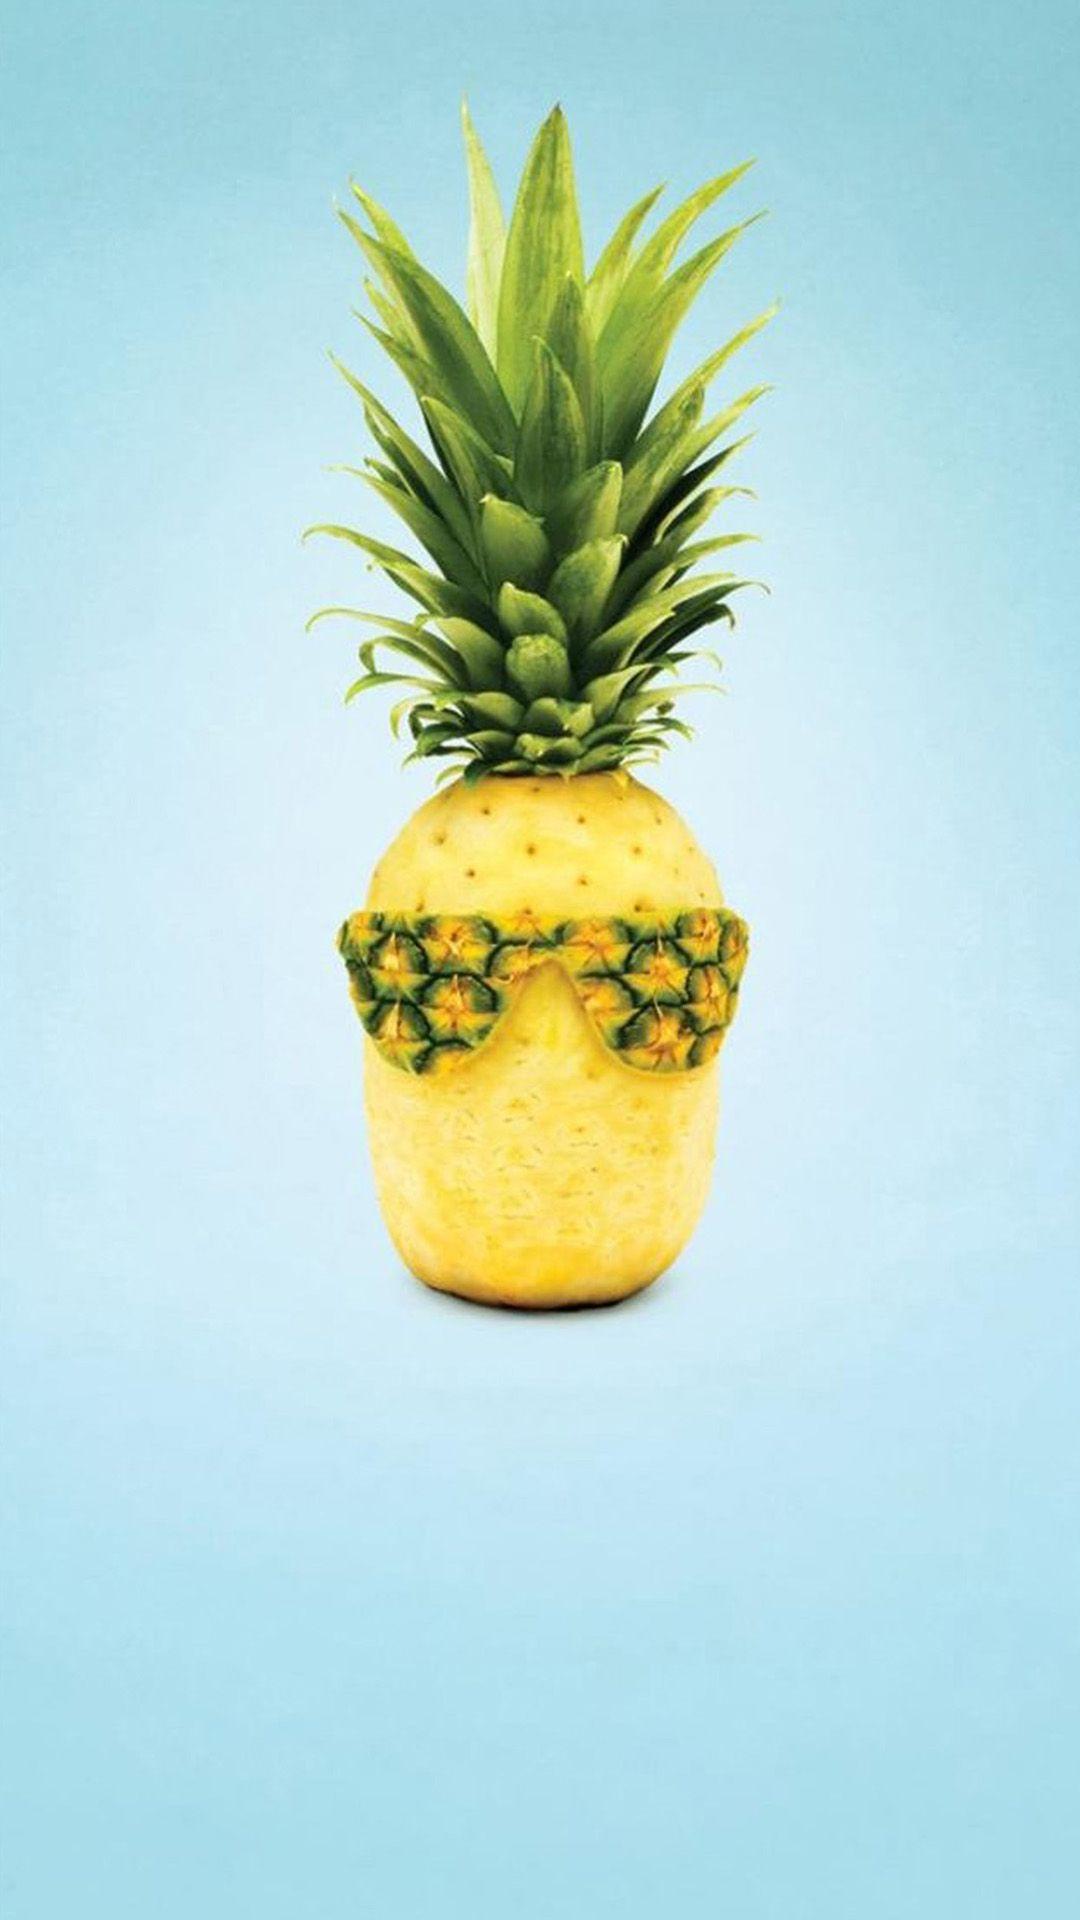 Cute Lovely Pineapple Fruit Iphone Wallpaper Best Wallpaper Hd Pineapple Fruit Carving Fruit